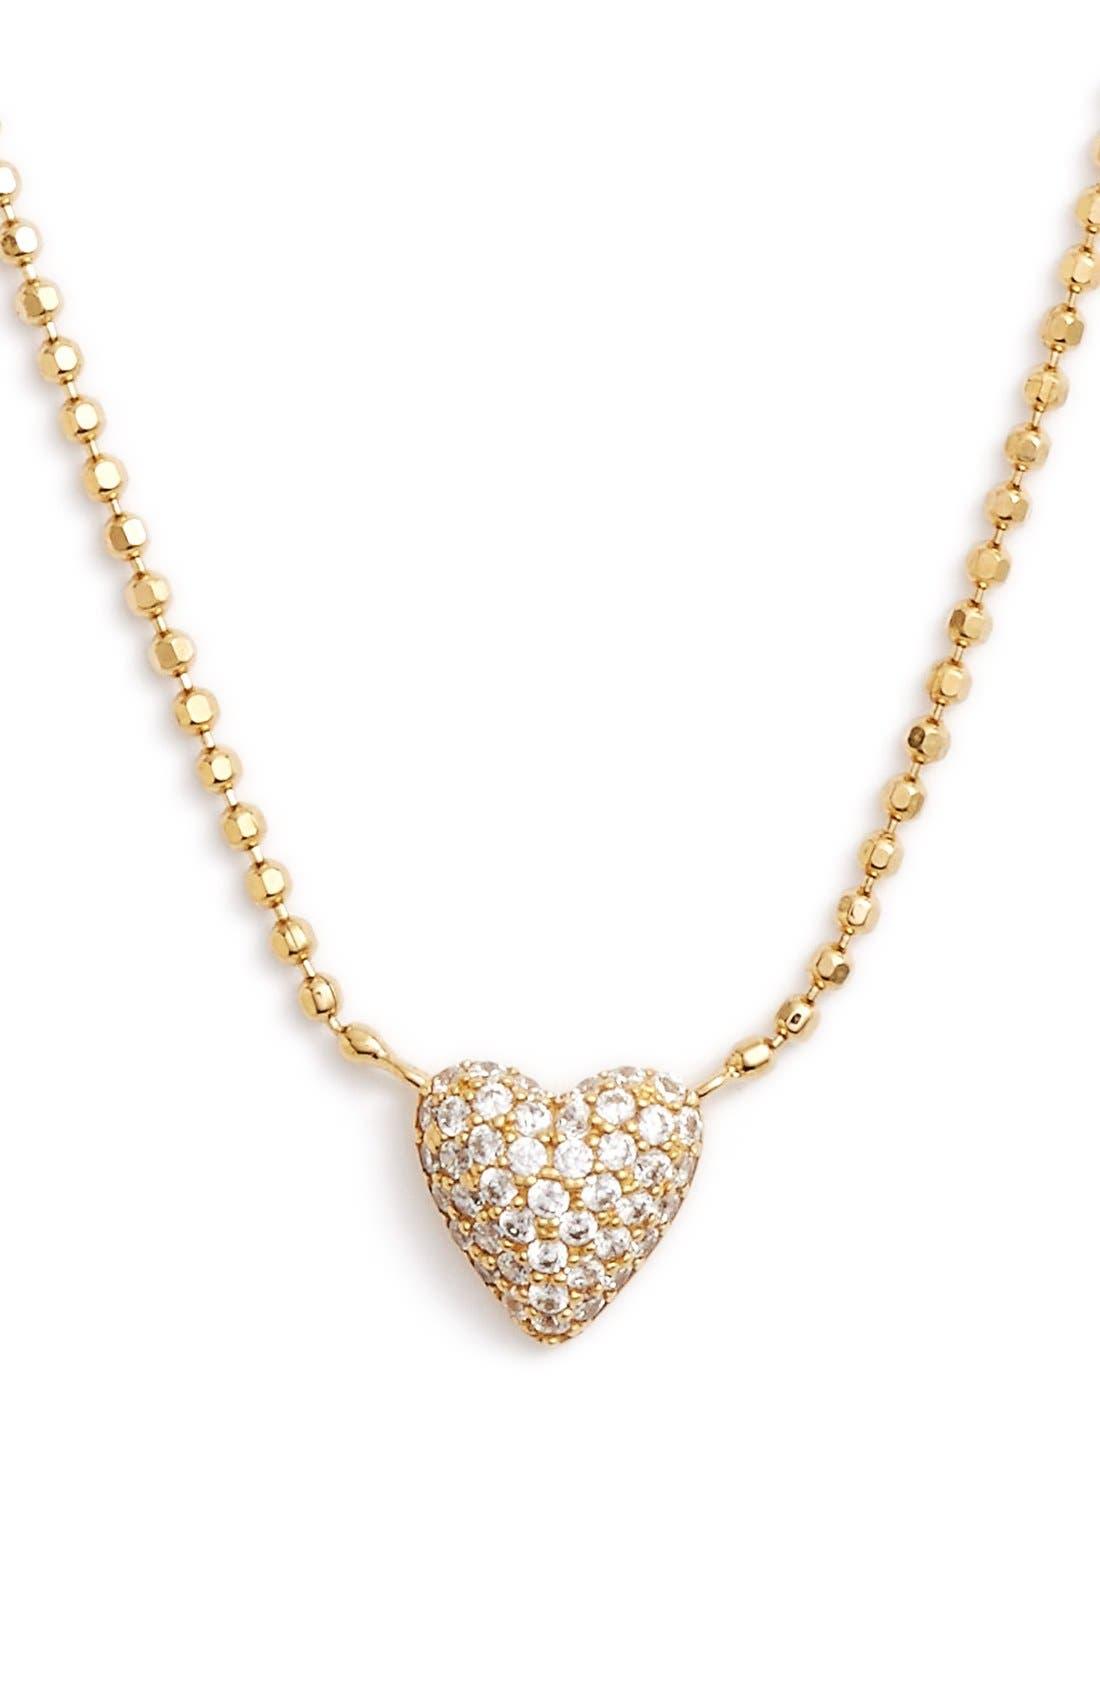 Alternate Image 1 Selected - Nadri 'Valentine's Day' Heart Pendant Necklace